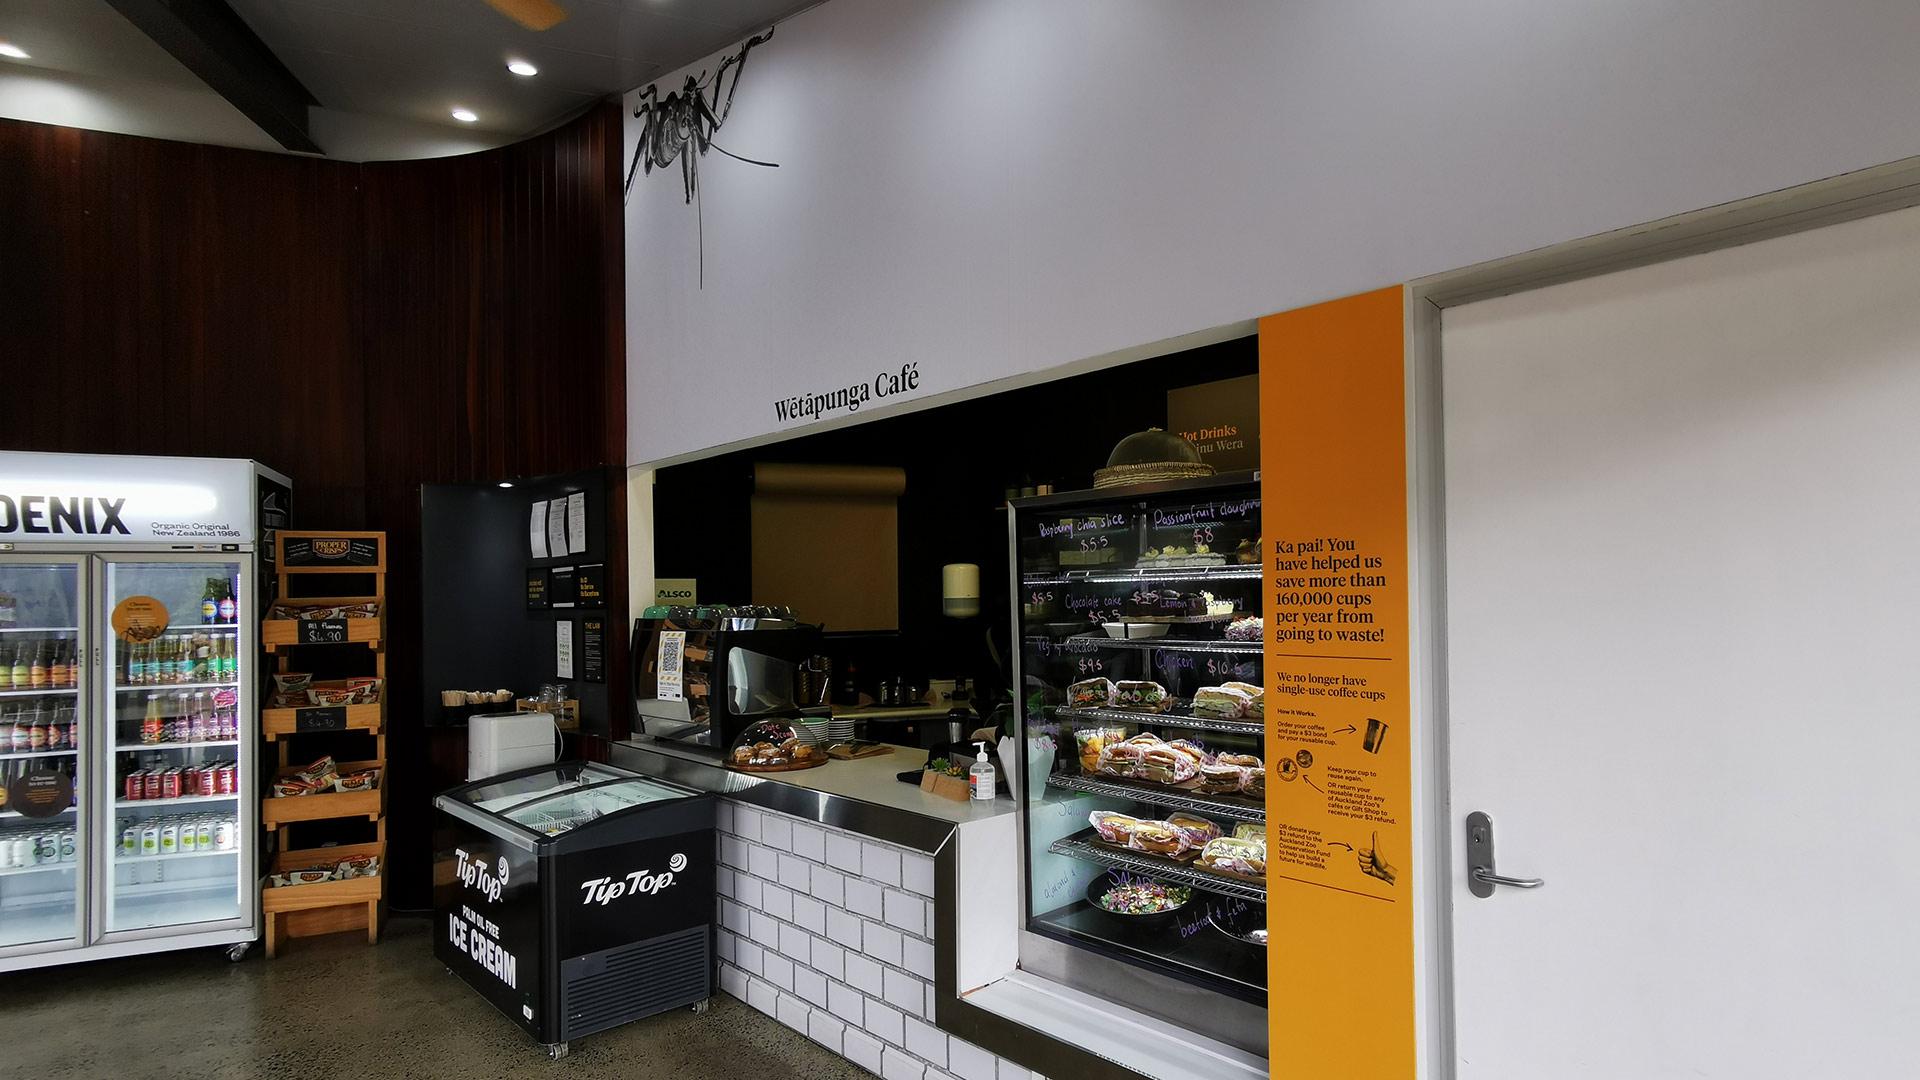 https://rfacdn.nz/zoo/assets/media/wetapunga-cafe-interior-gallery.jpg